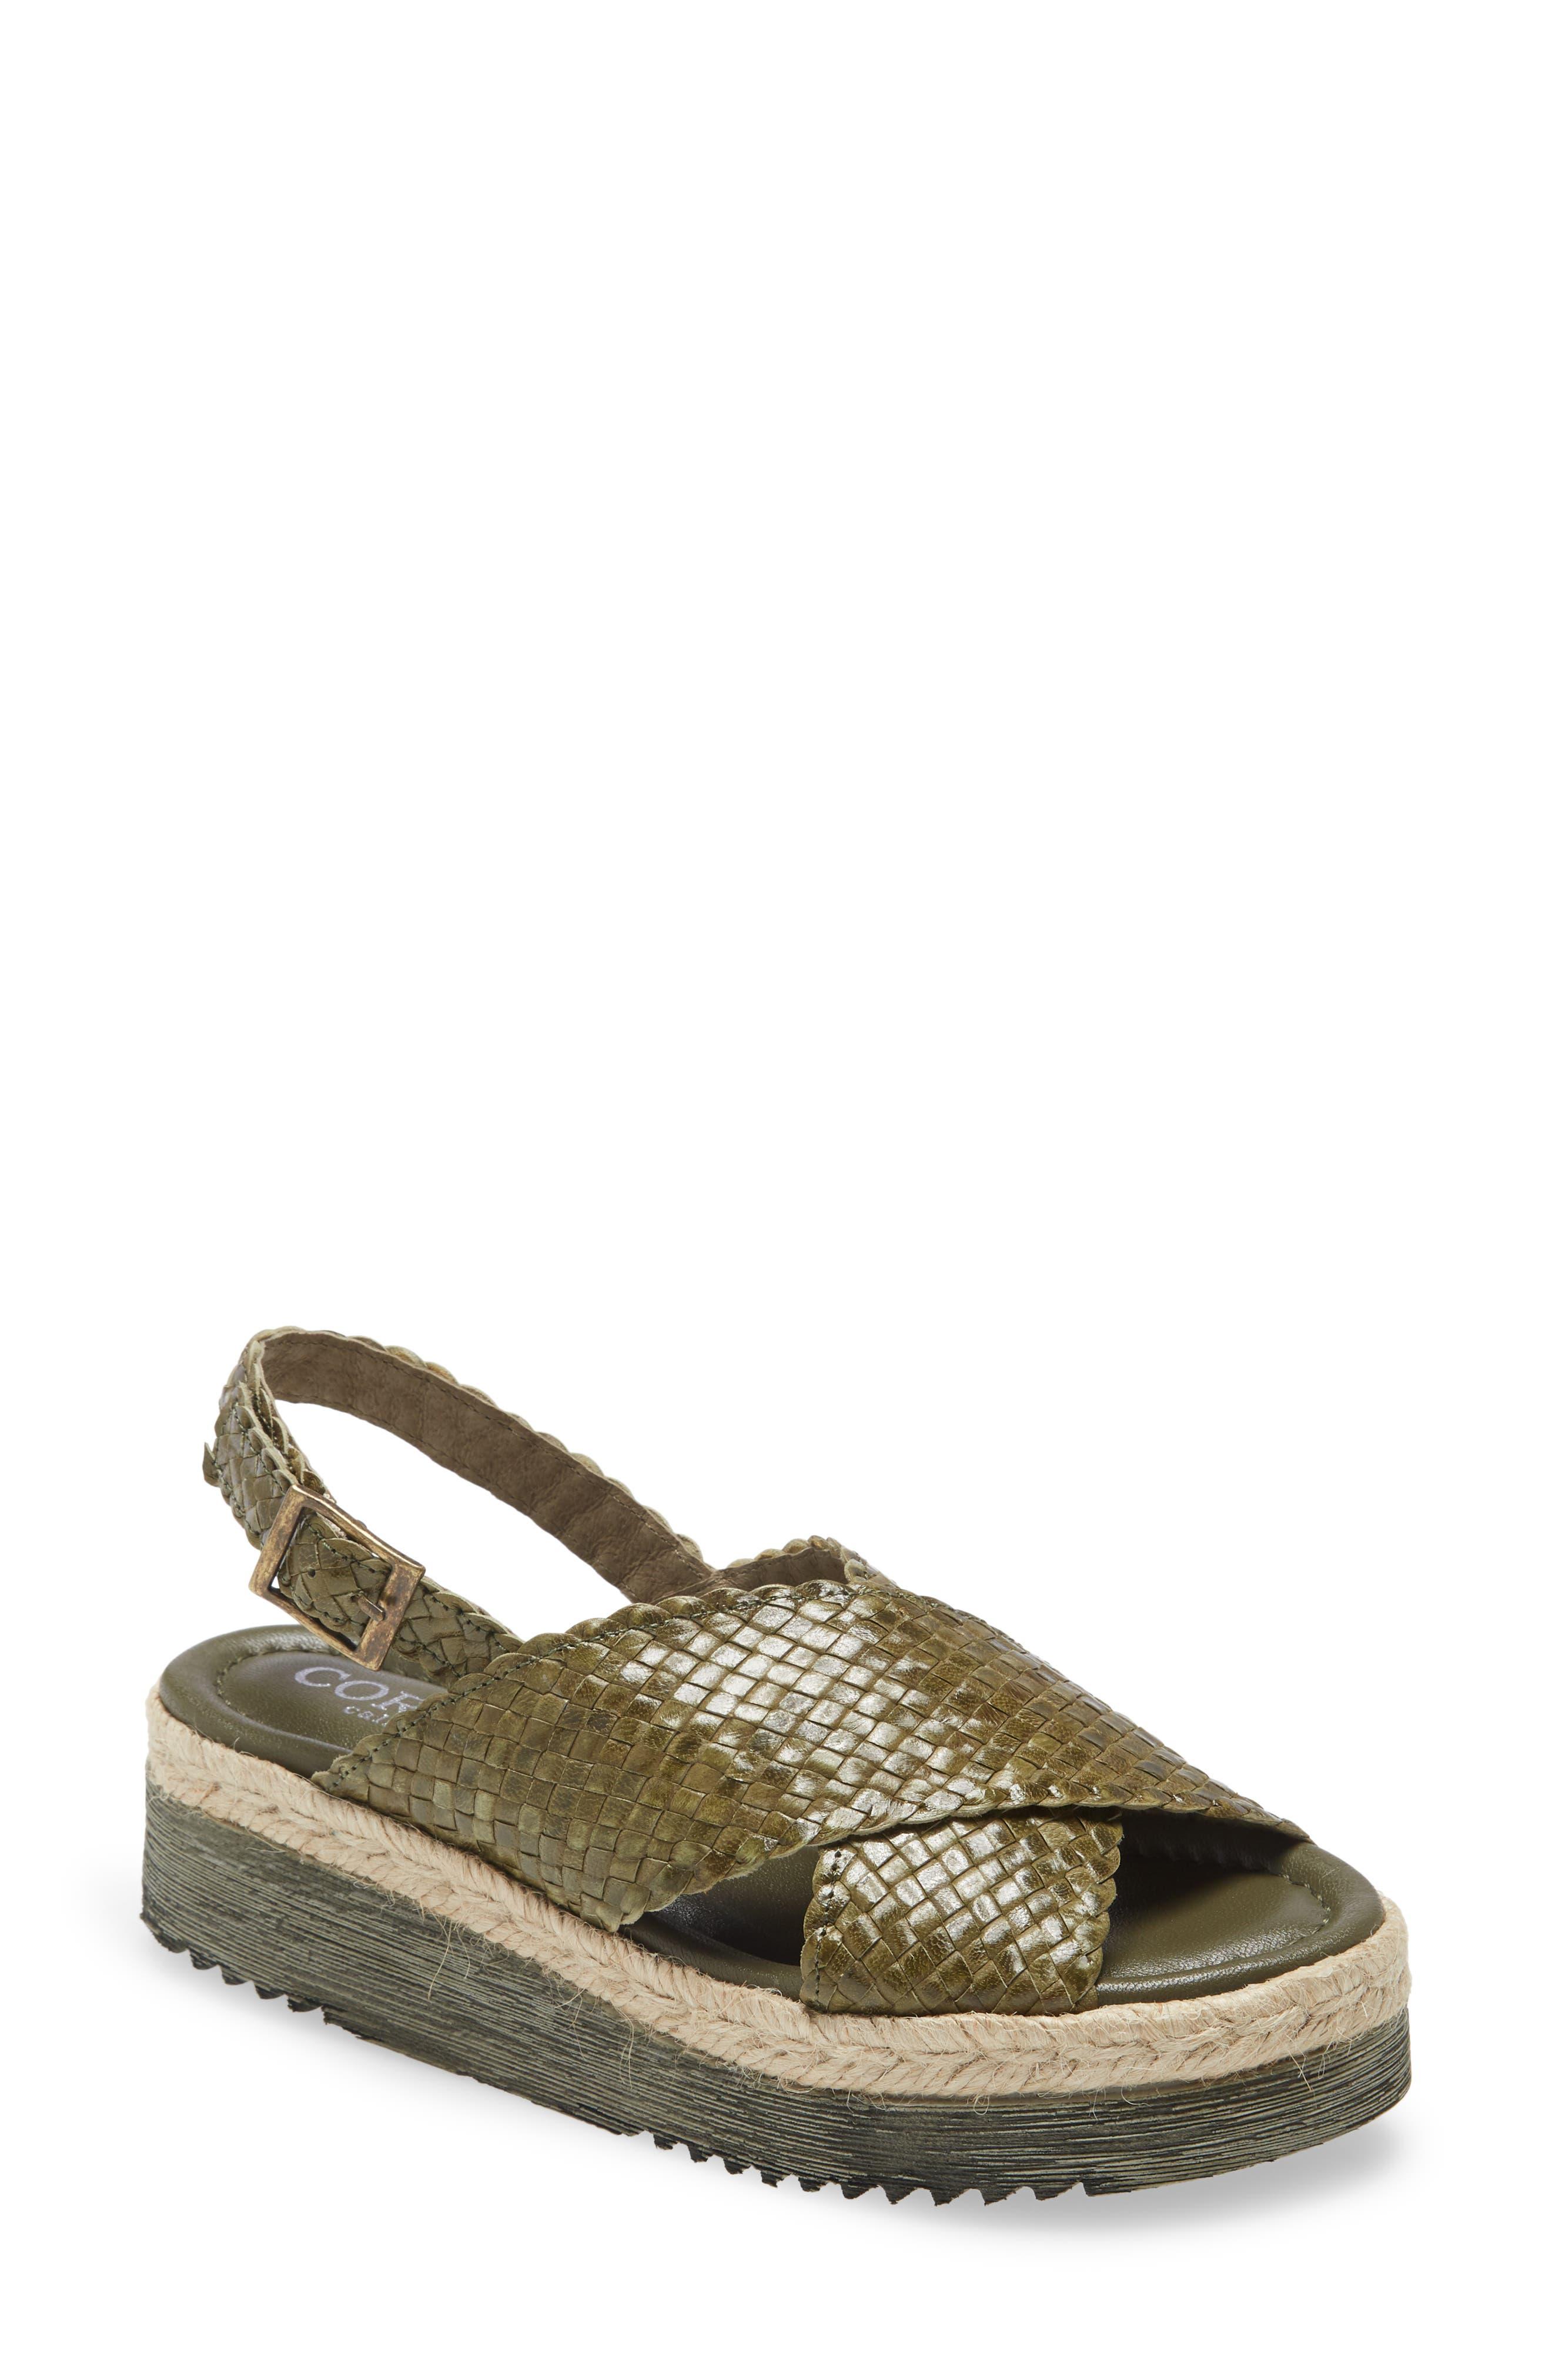 Sindee Woven Platform Sandal